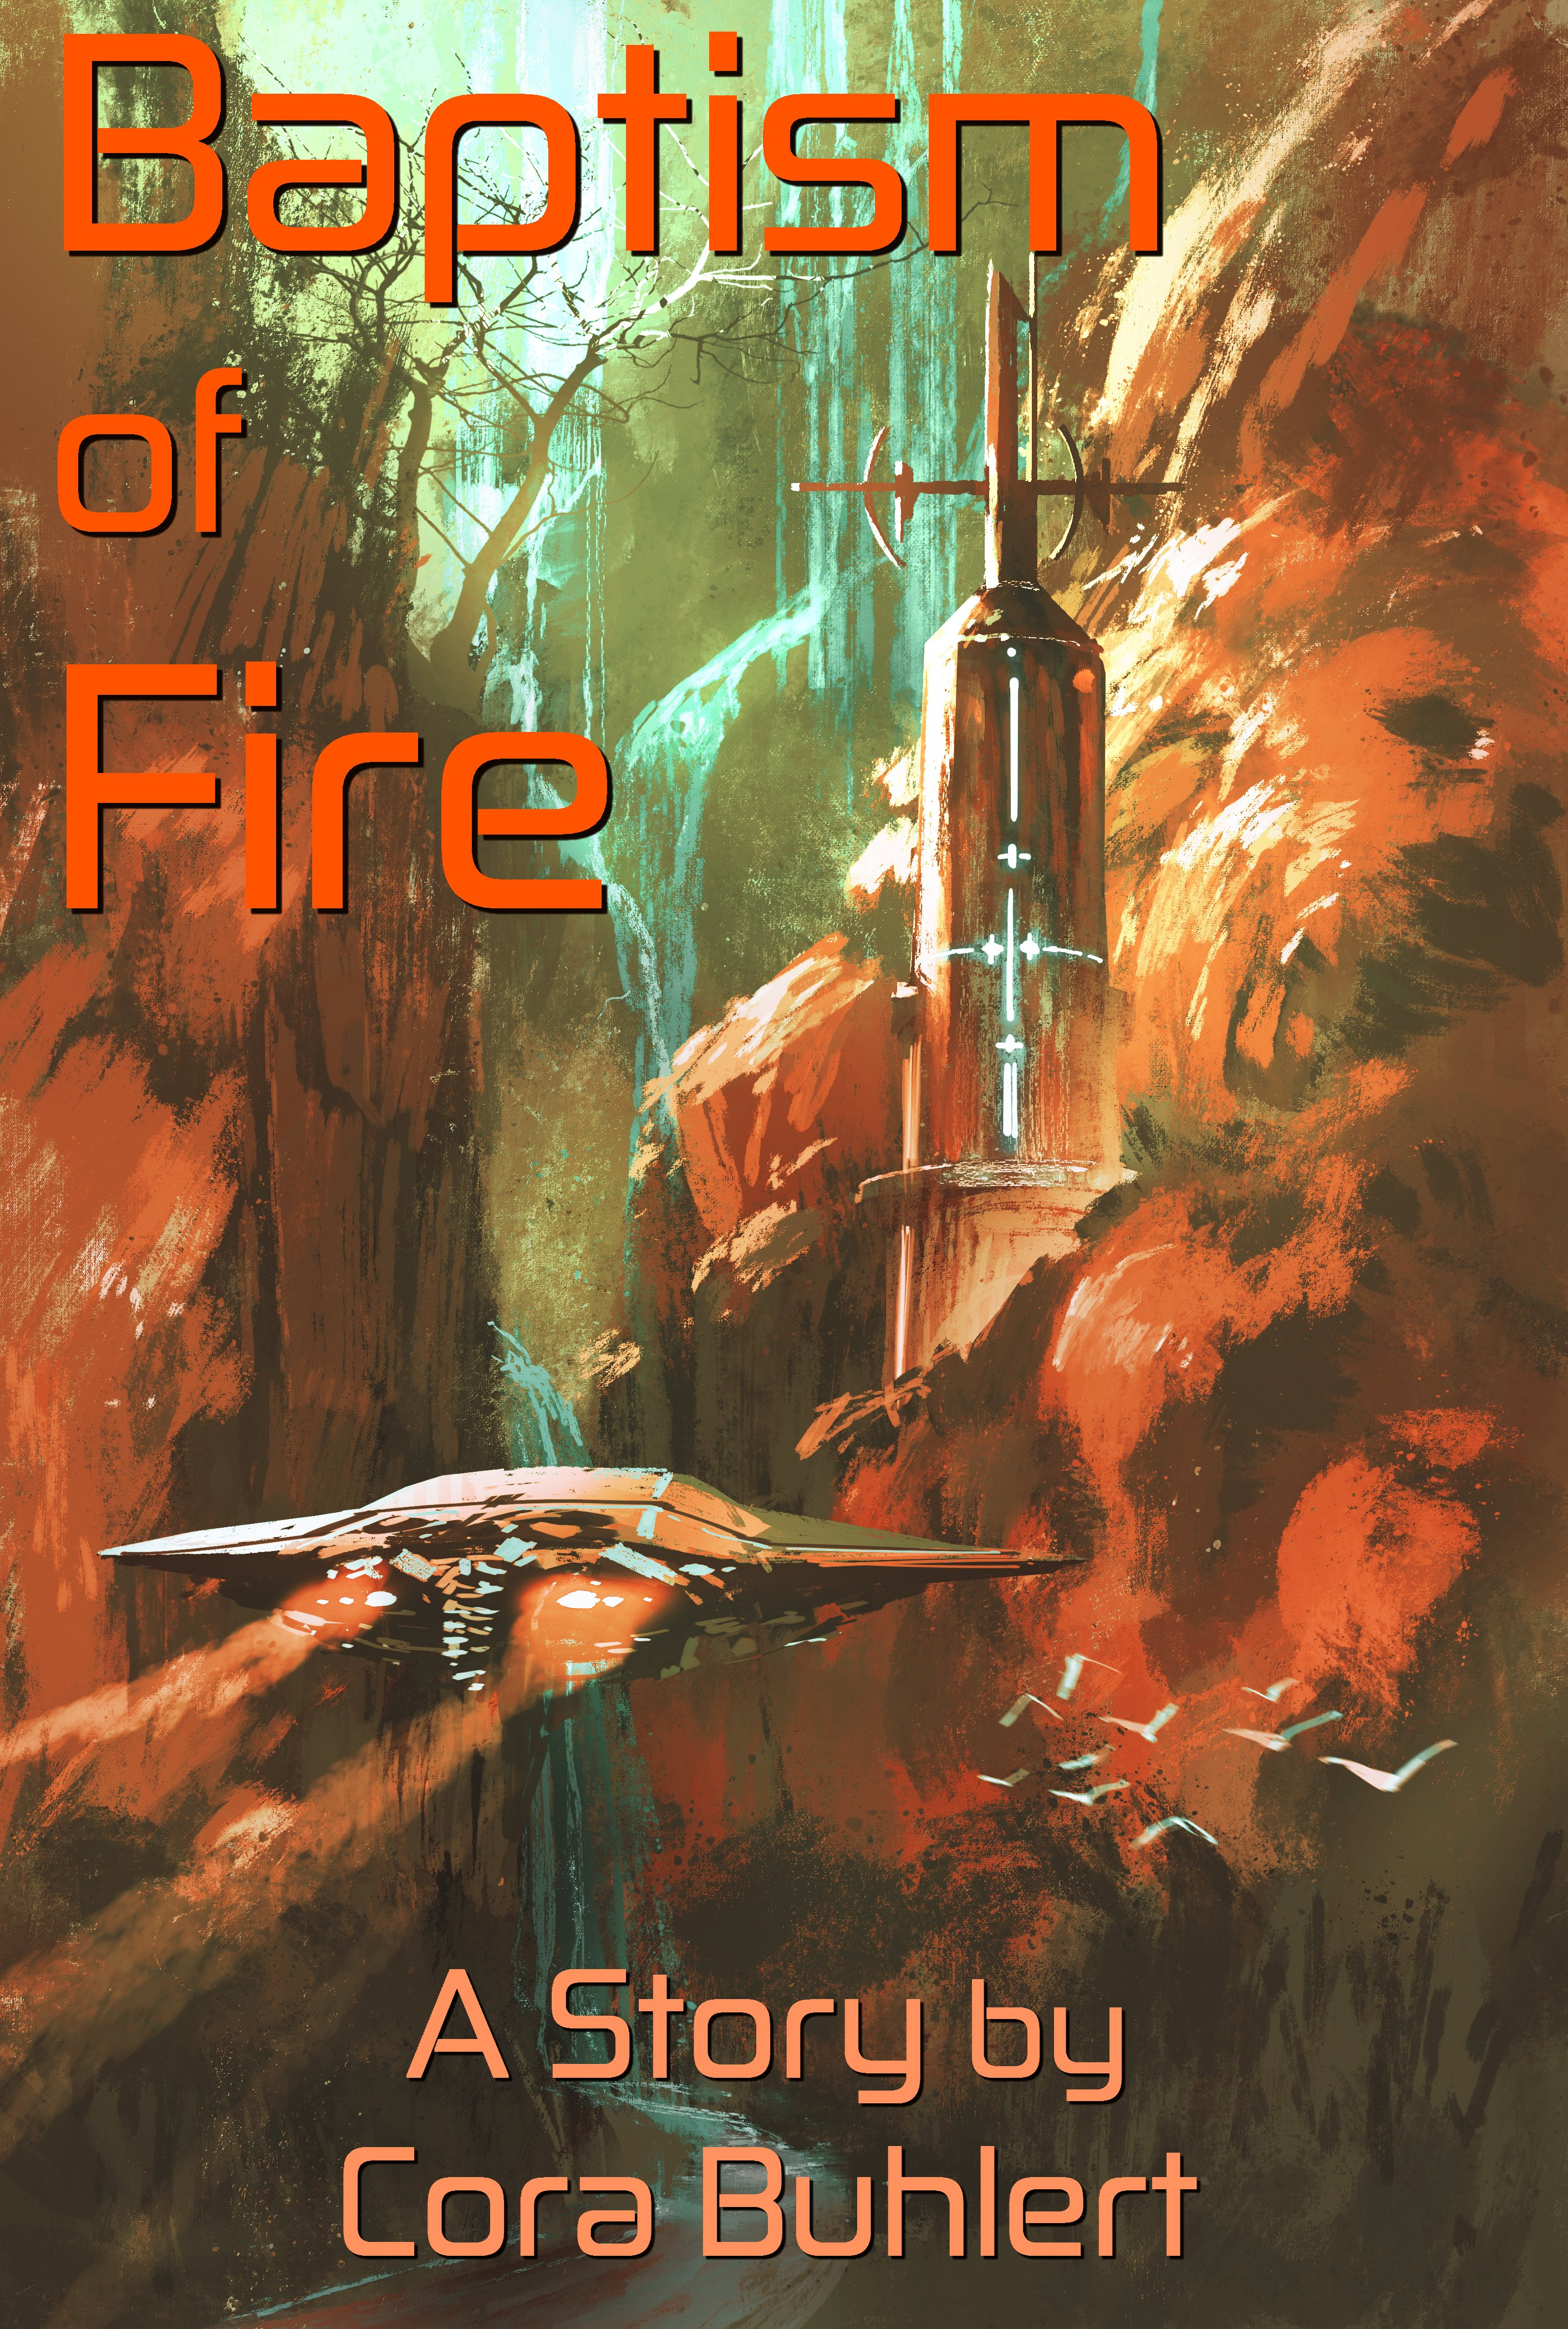 Science Fiction | Cora Buhlert